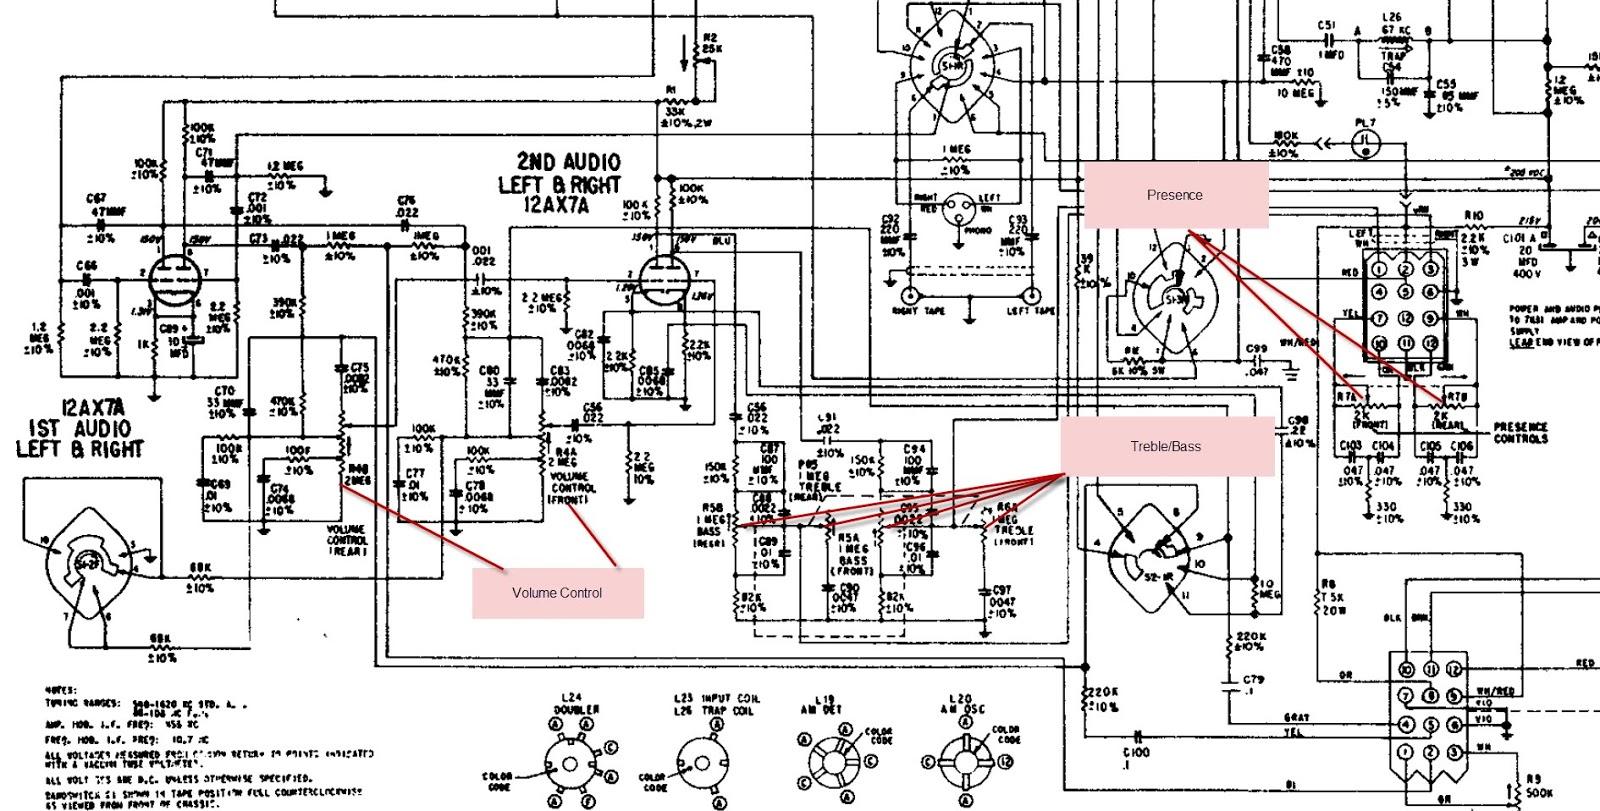 [DIAGRAM_4PO]  TG_3637] Vintage Unity Spotlight Wiring Diagram Download Diagram | Vintage Spotlight Wiring Diagram |  | Ymoon Epete Kargi Inifo Lectu Bios Xolia Jidig Barep Subd Bepta  Mohammedshrine Librar Wiring 101